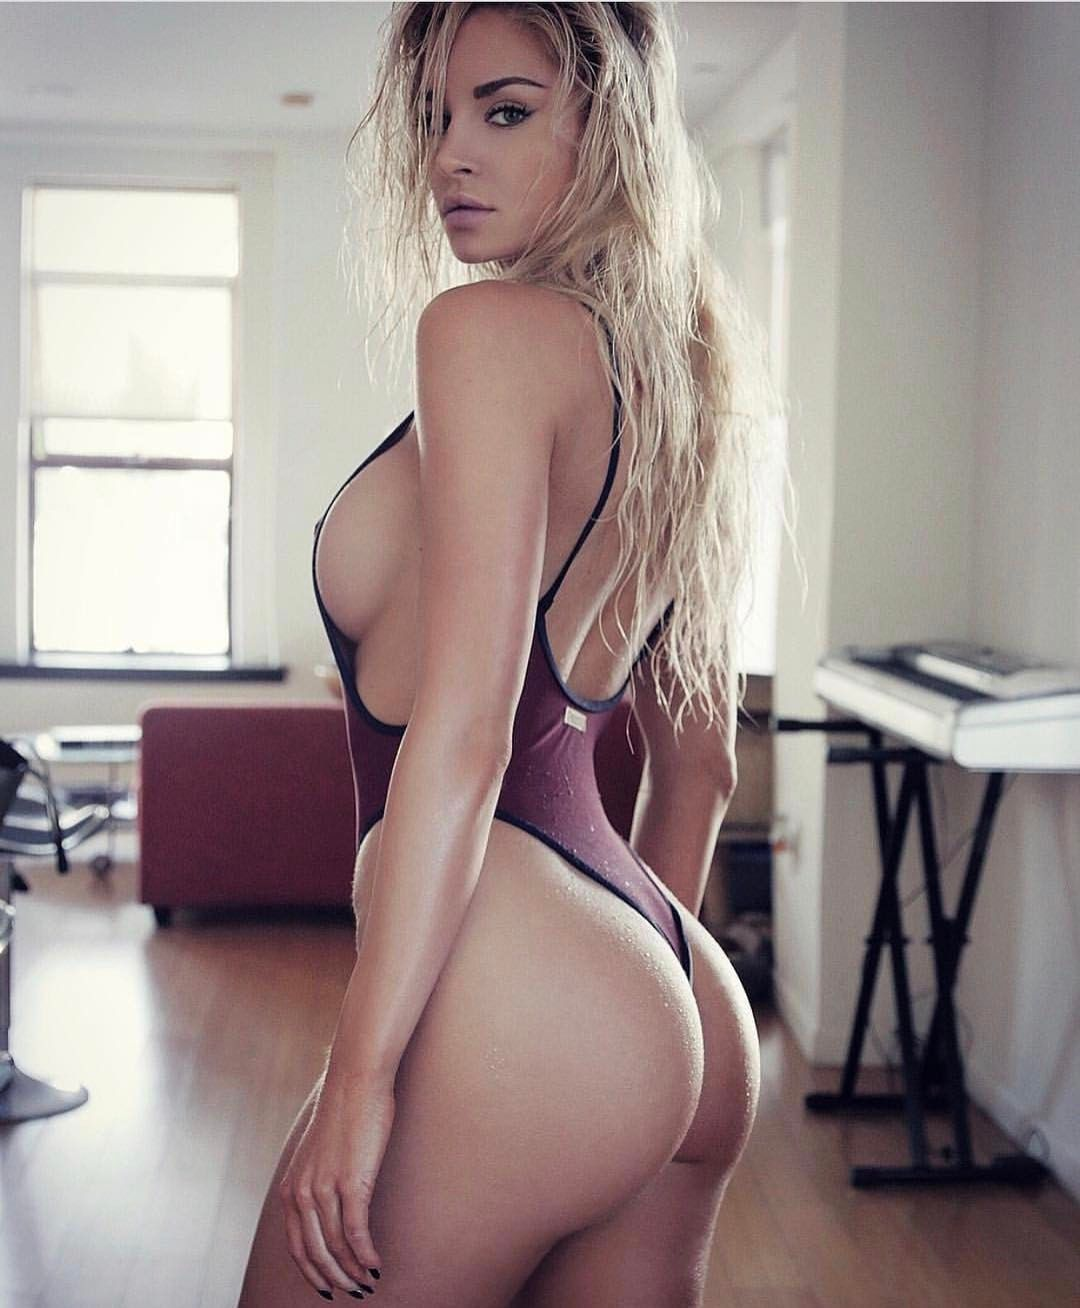 ilsa fisher nude pics